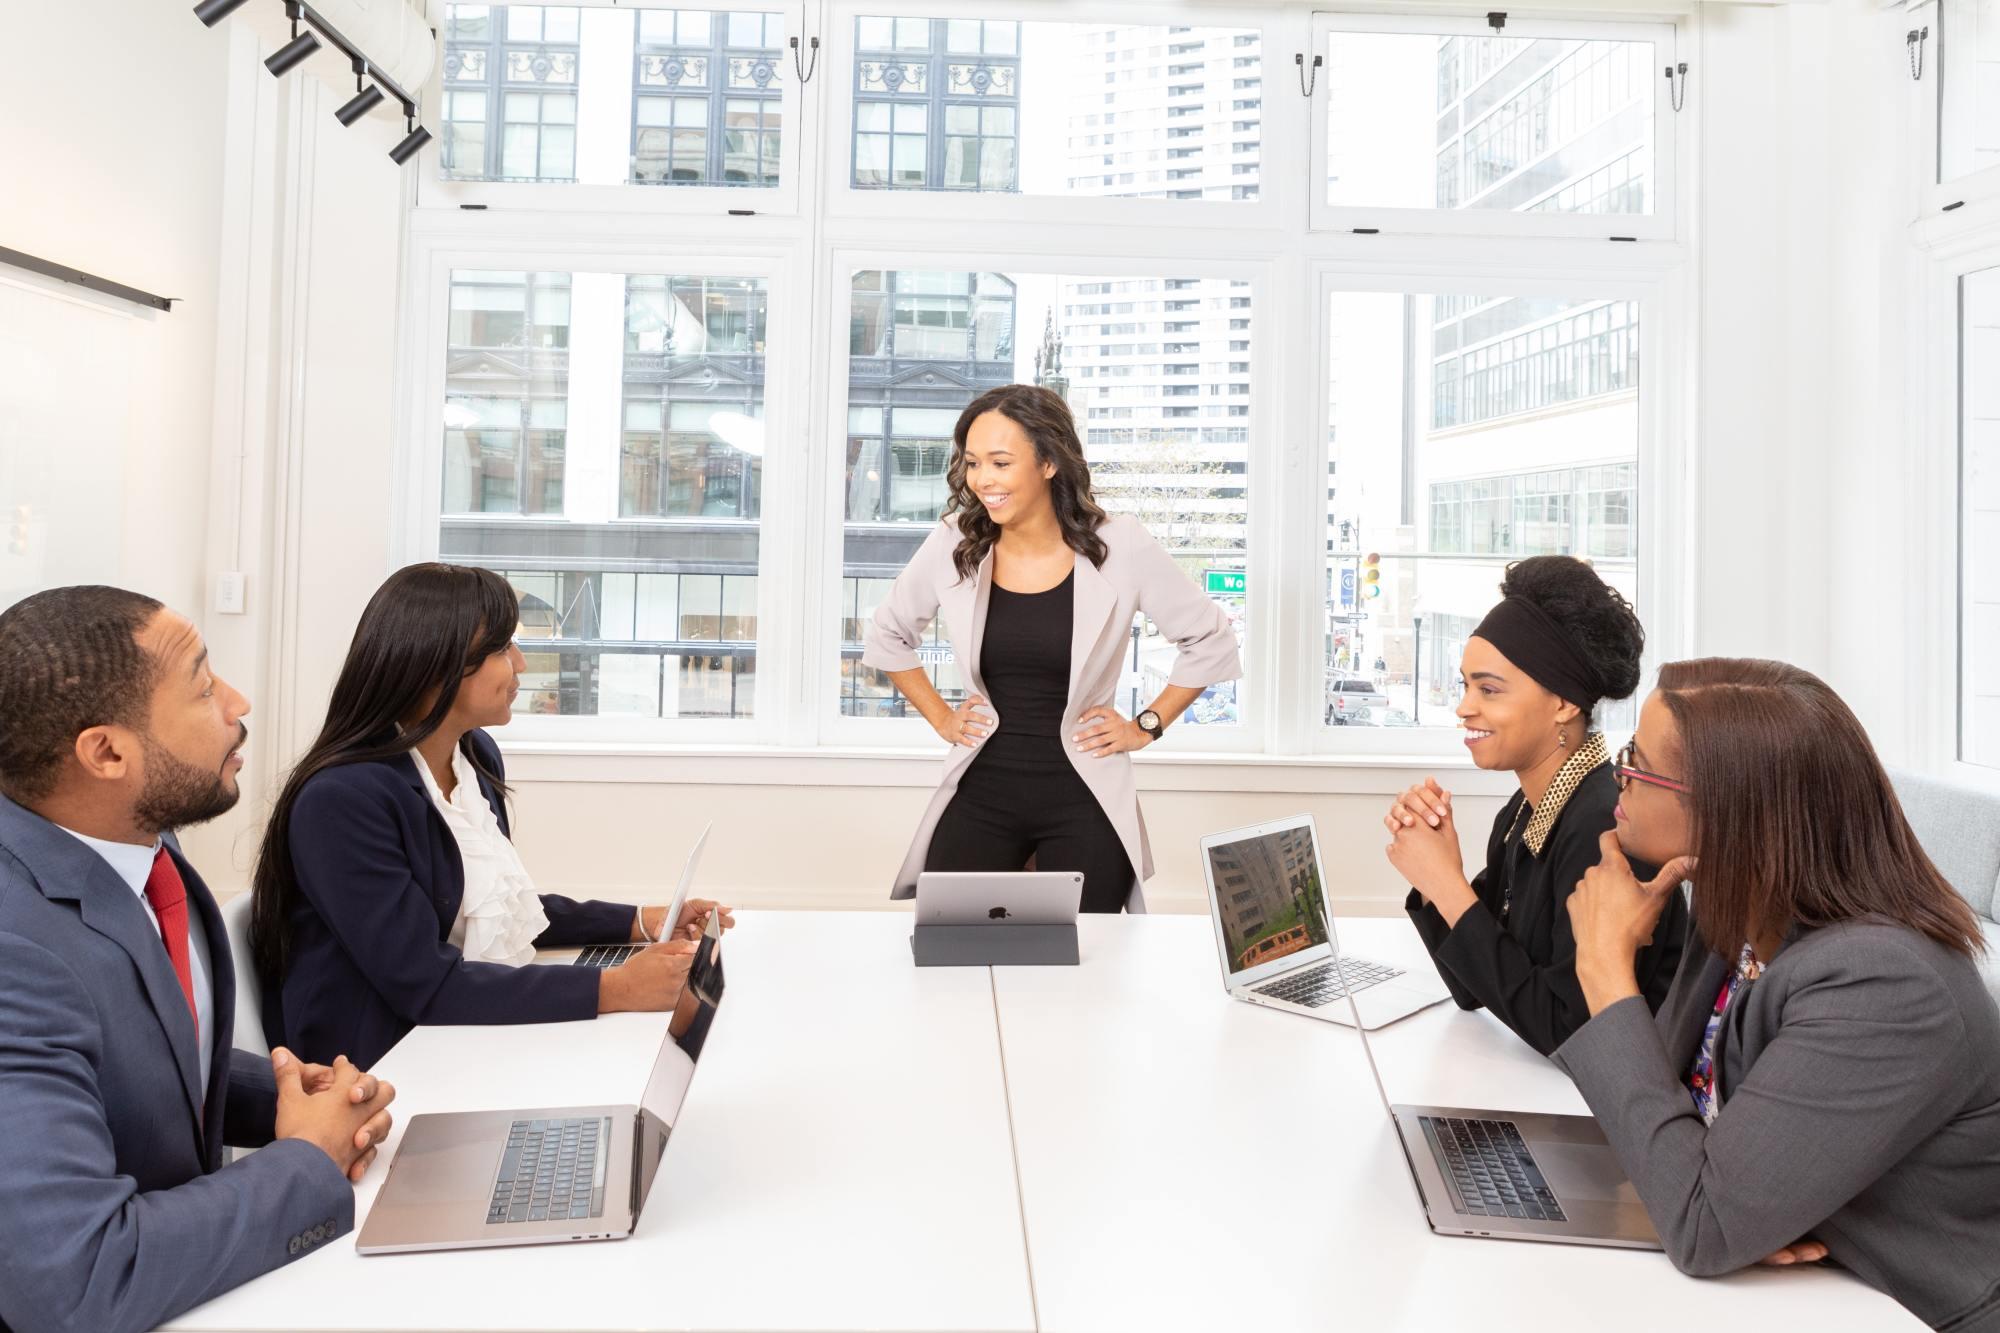 Careers Images - Meeting